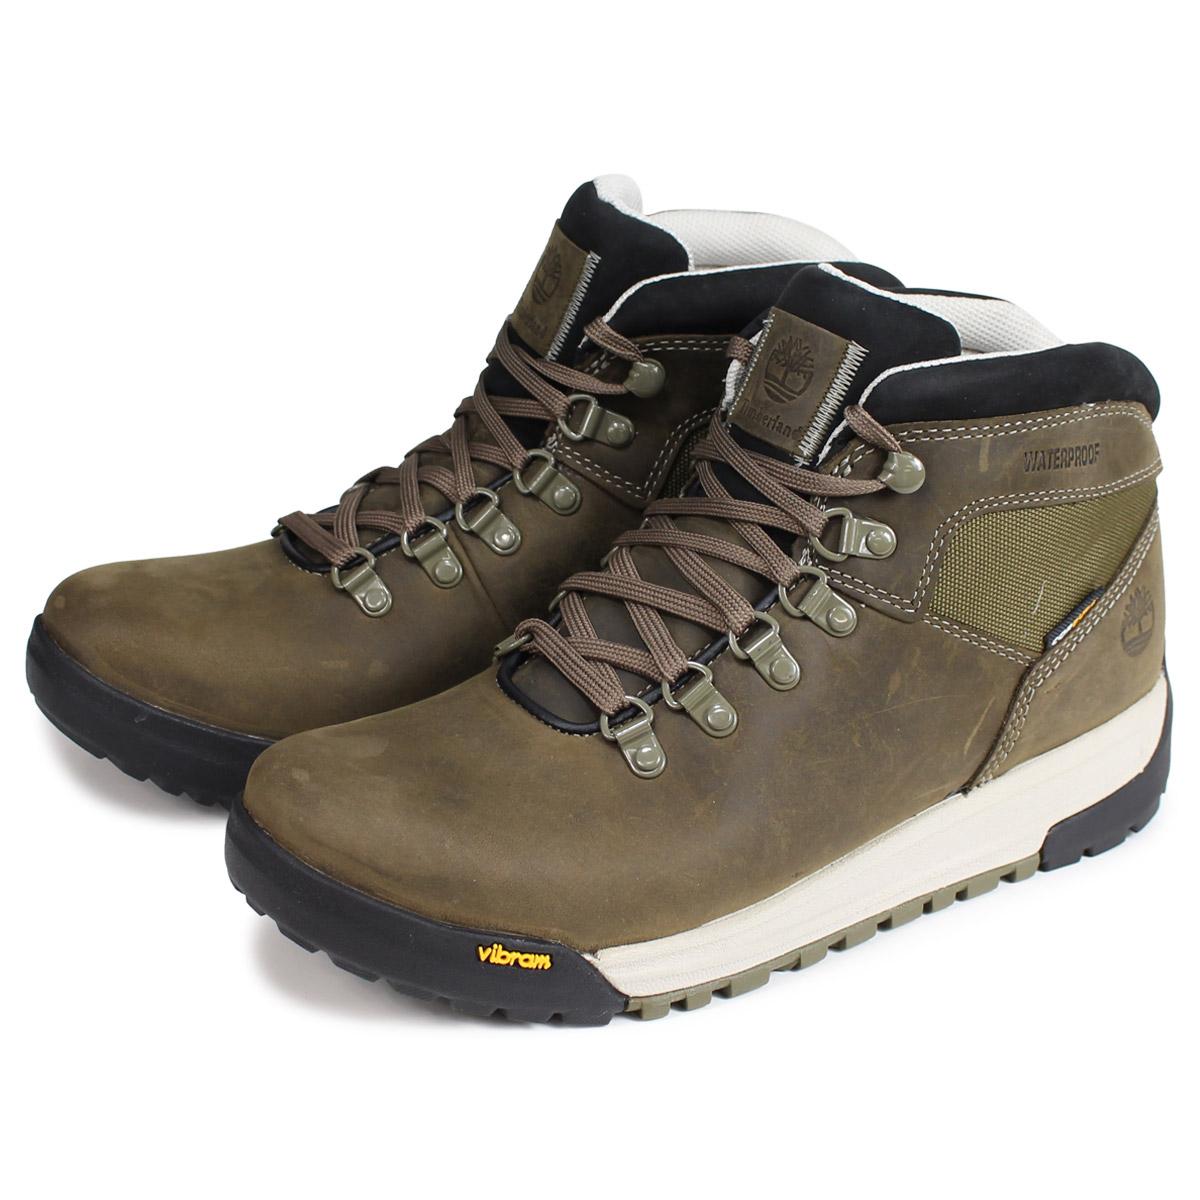 Men's GT Scramble Mid Waterproof Boots   Timberland US Store